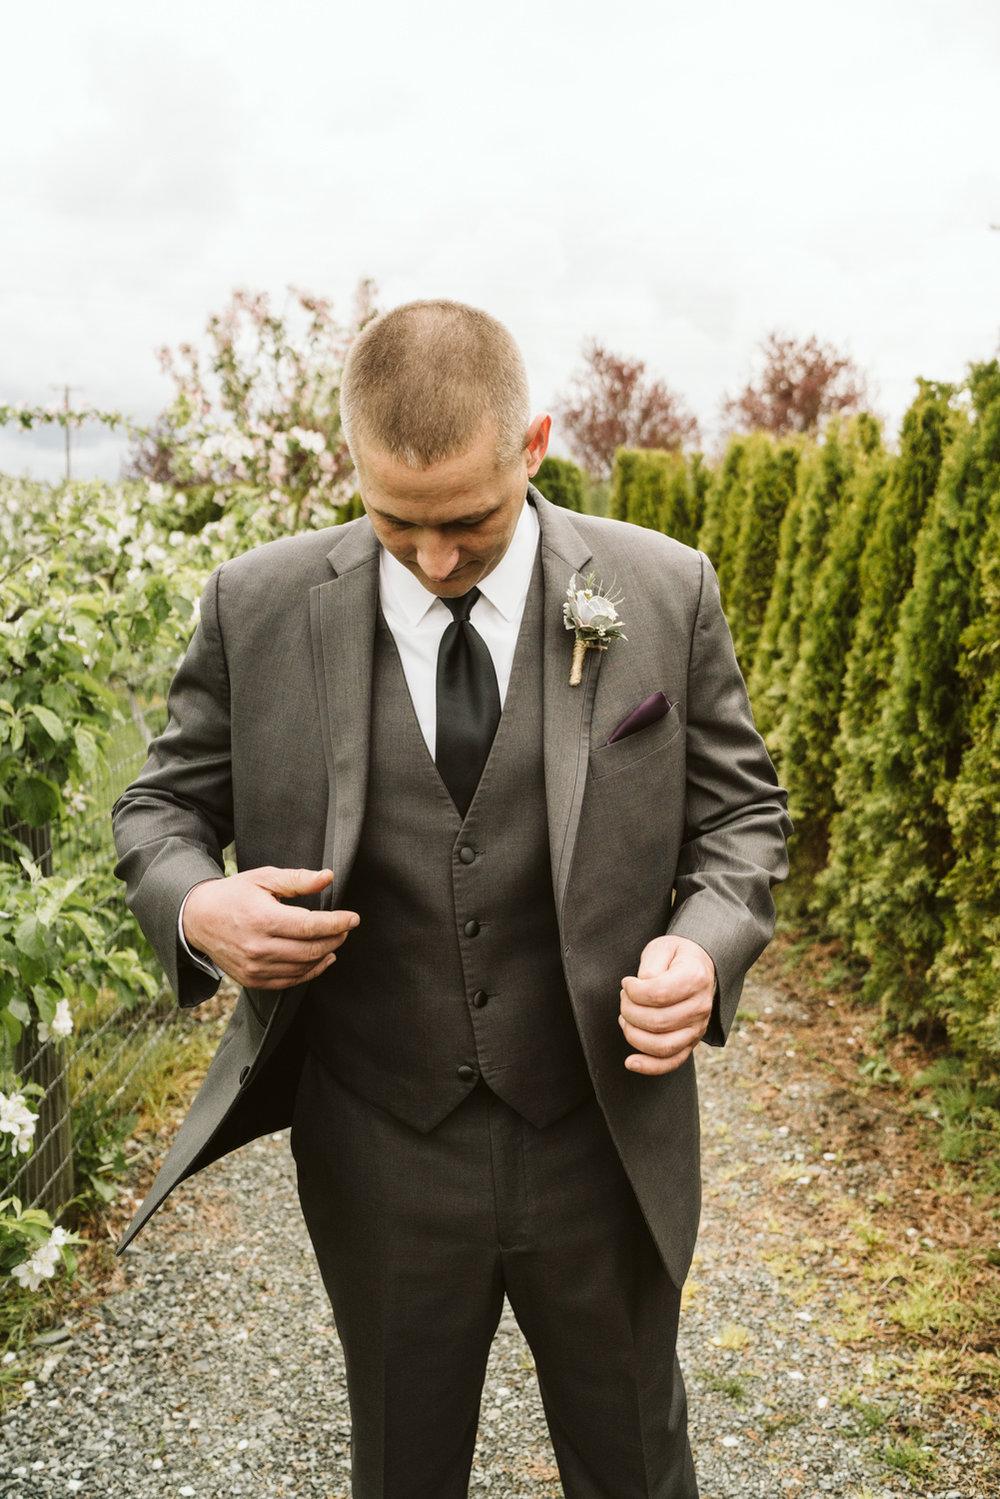 April Yentas Photography - jen and anthony wedding-12.jpg